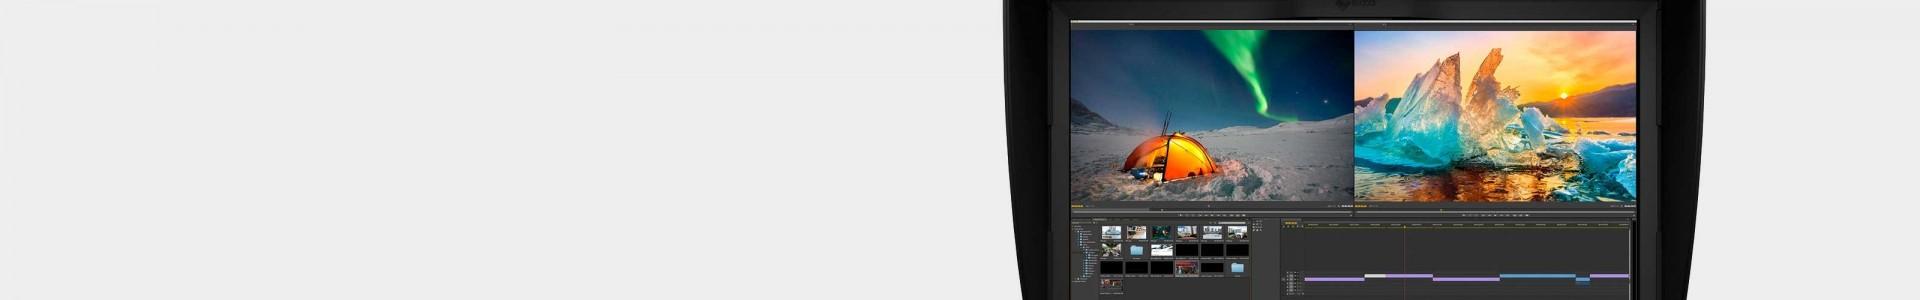 Postproduction and Color Correction Monitors - Avacab